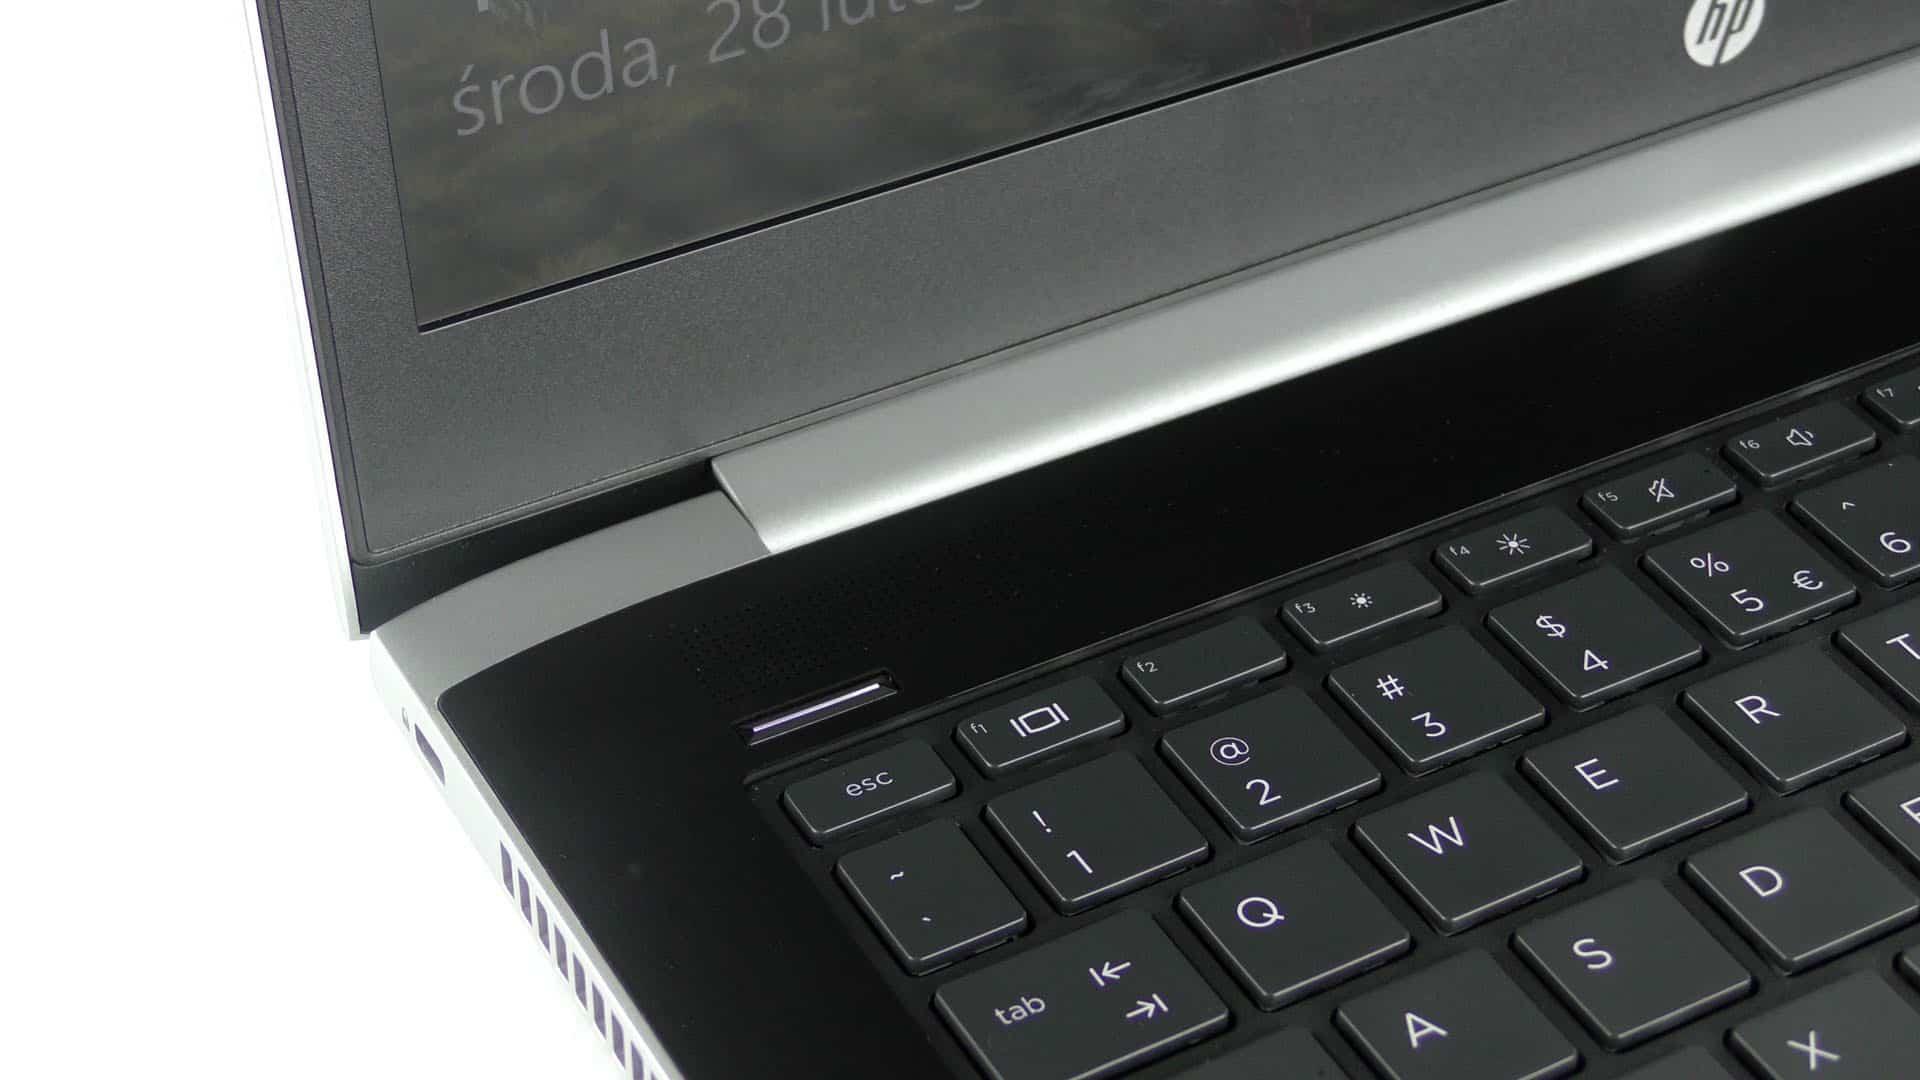 HP ProBook 440 G5 aluminiowy pulpit